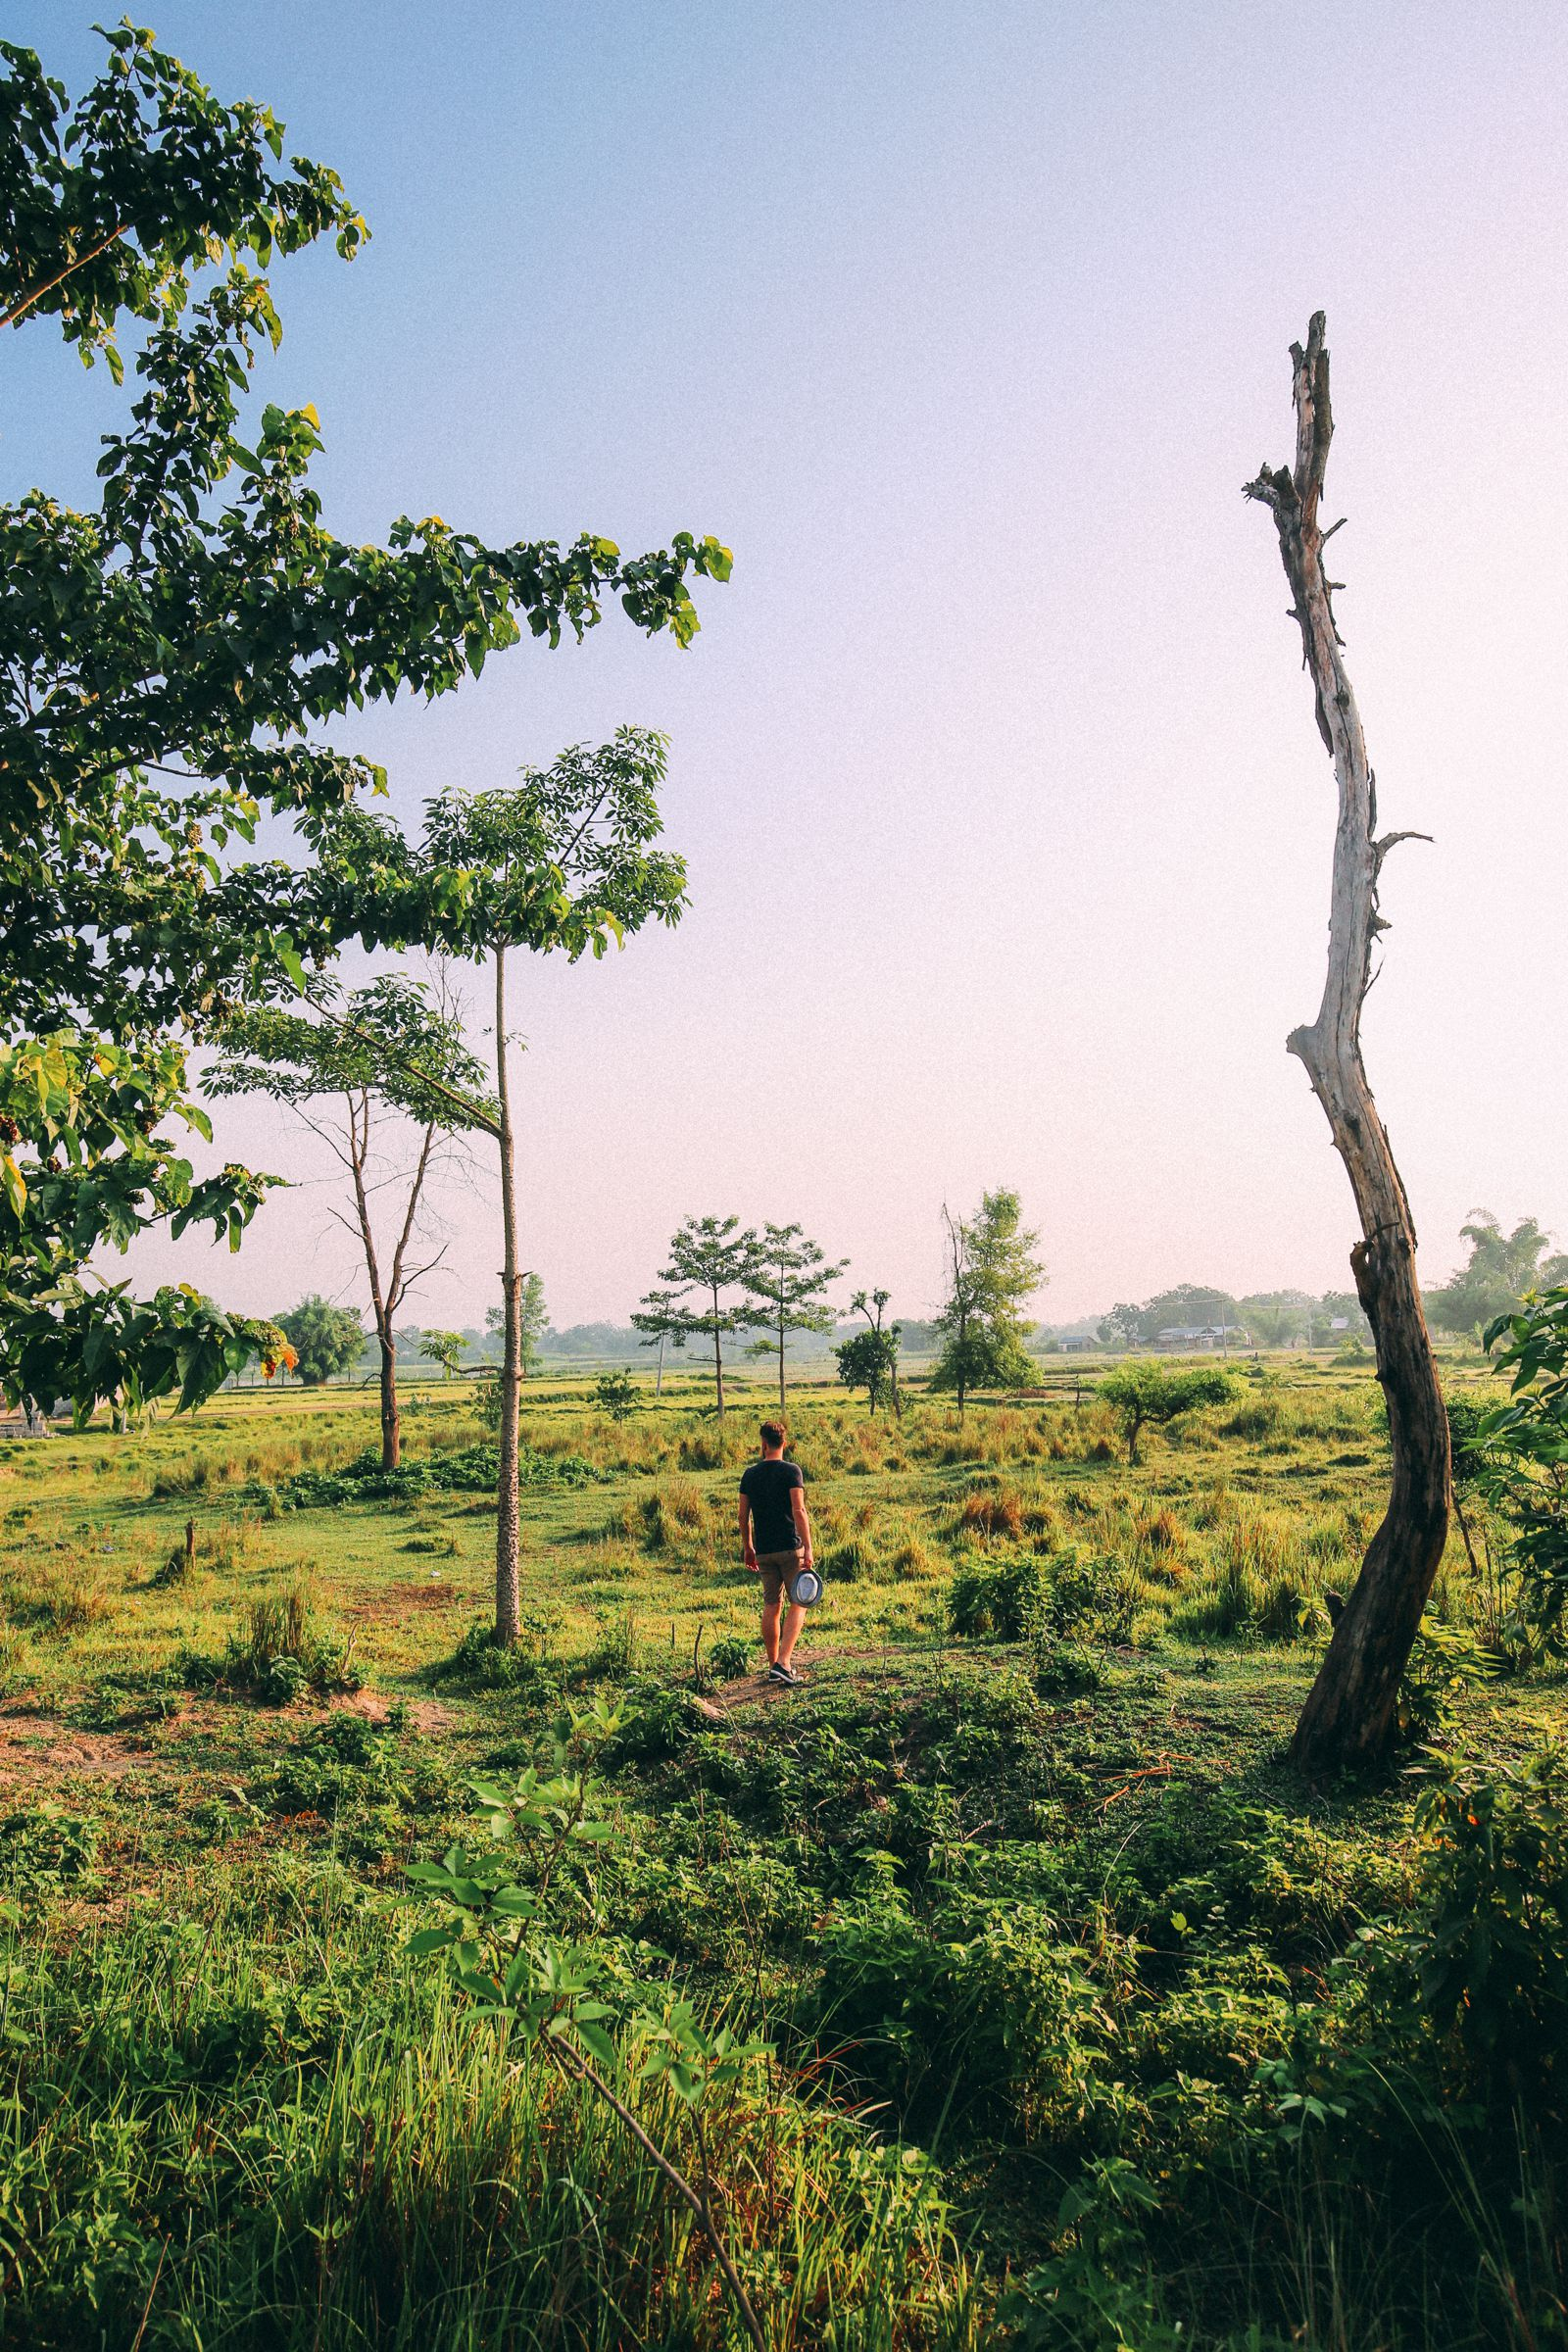 Photos And Postcards From Nepal... Chitwan, Kathmandu, Bhaktapur, Panauti, Pokhara, Tansen, Palpa, Lumbini (4)